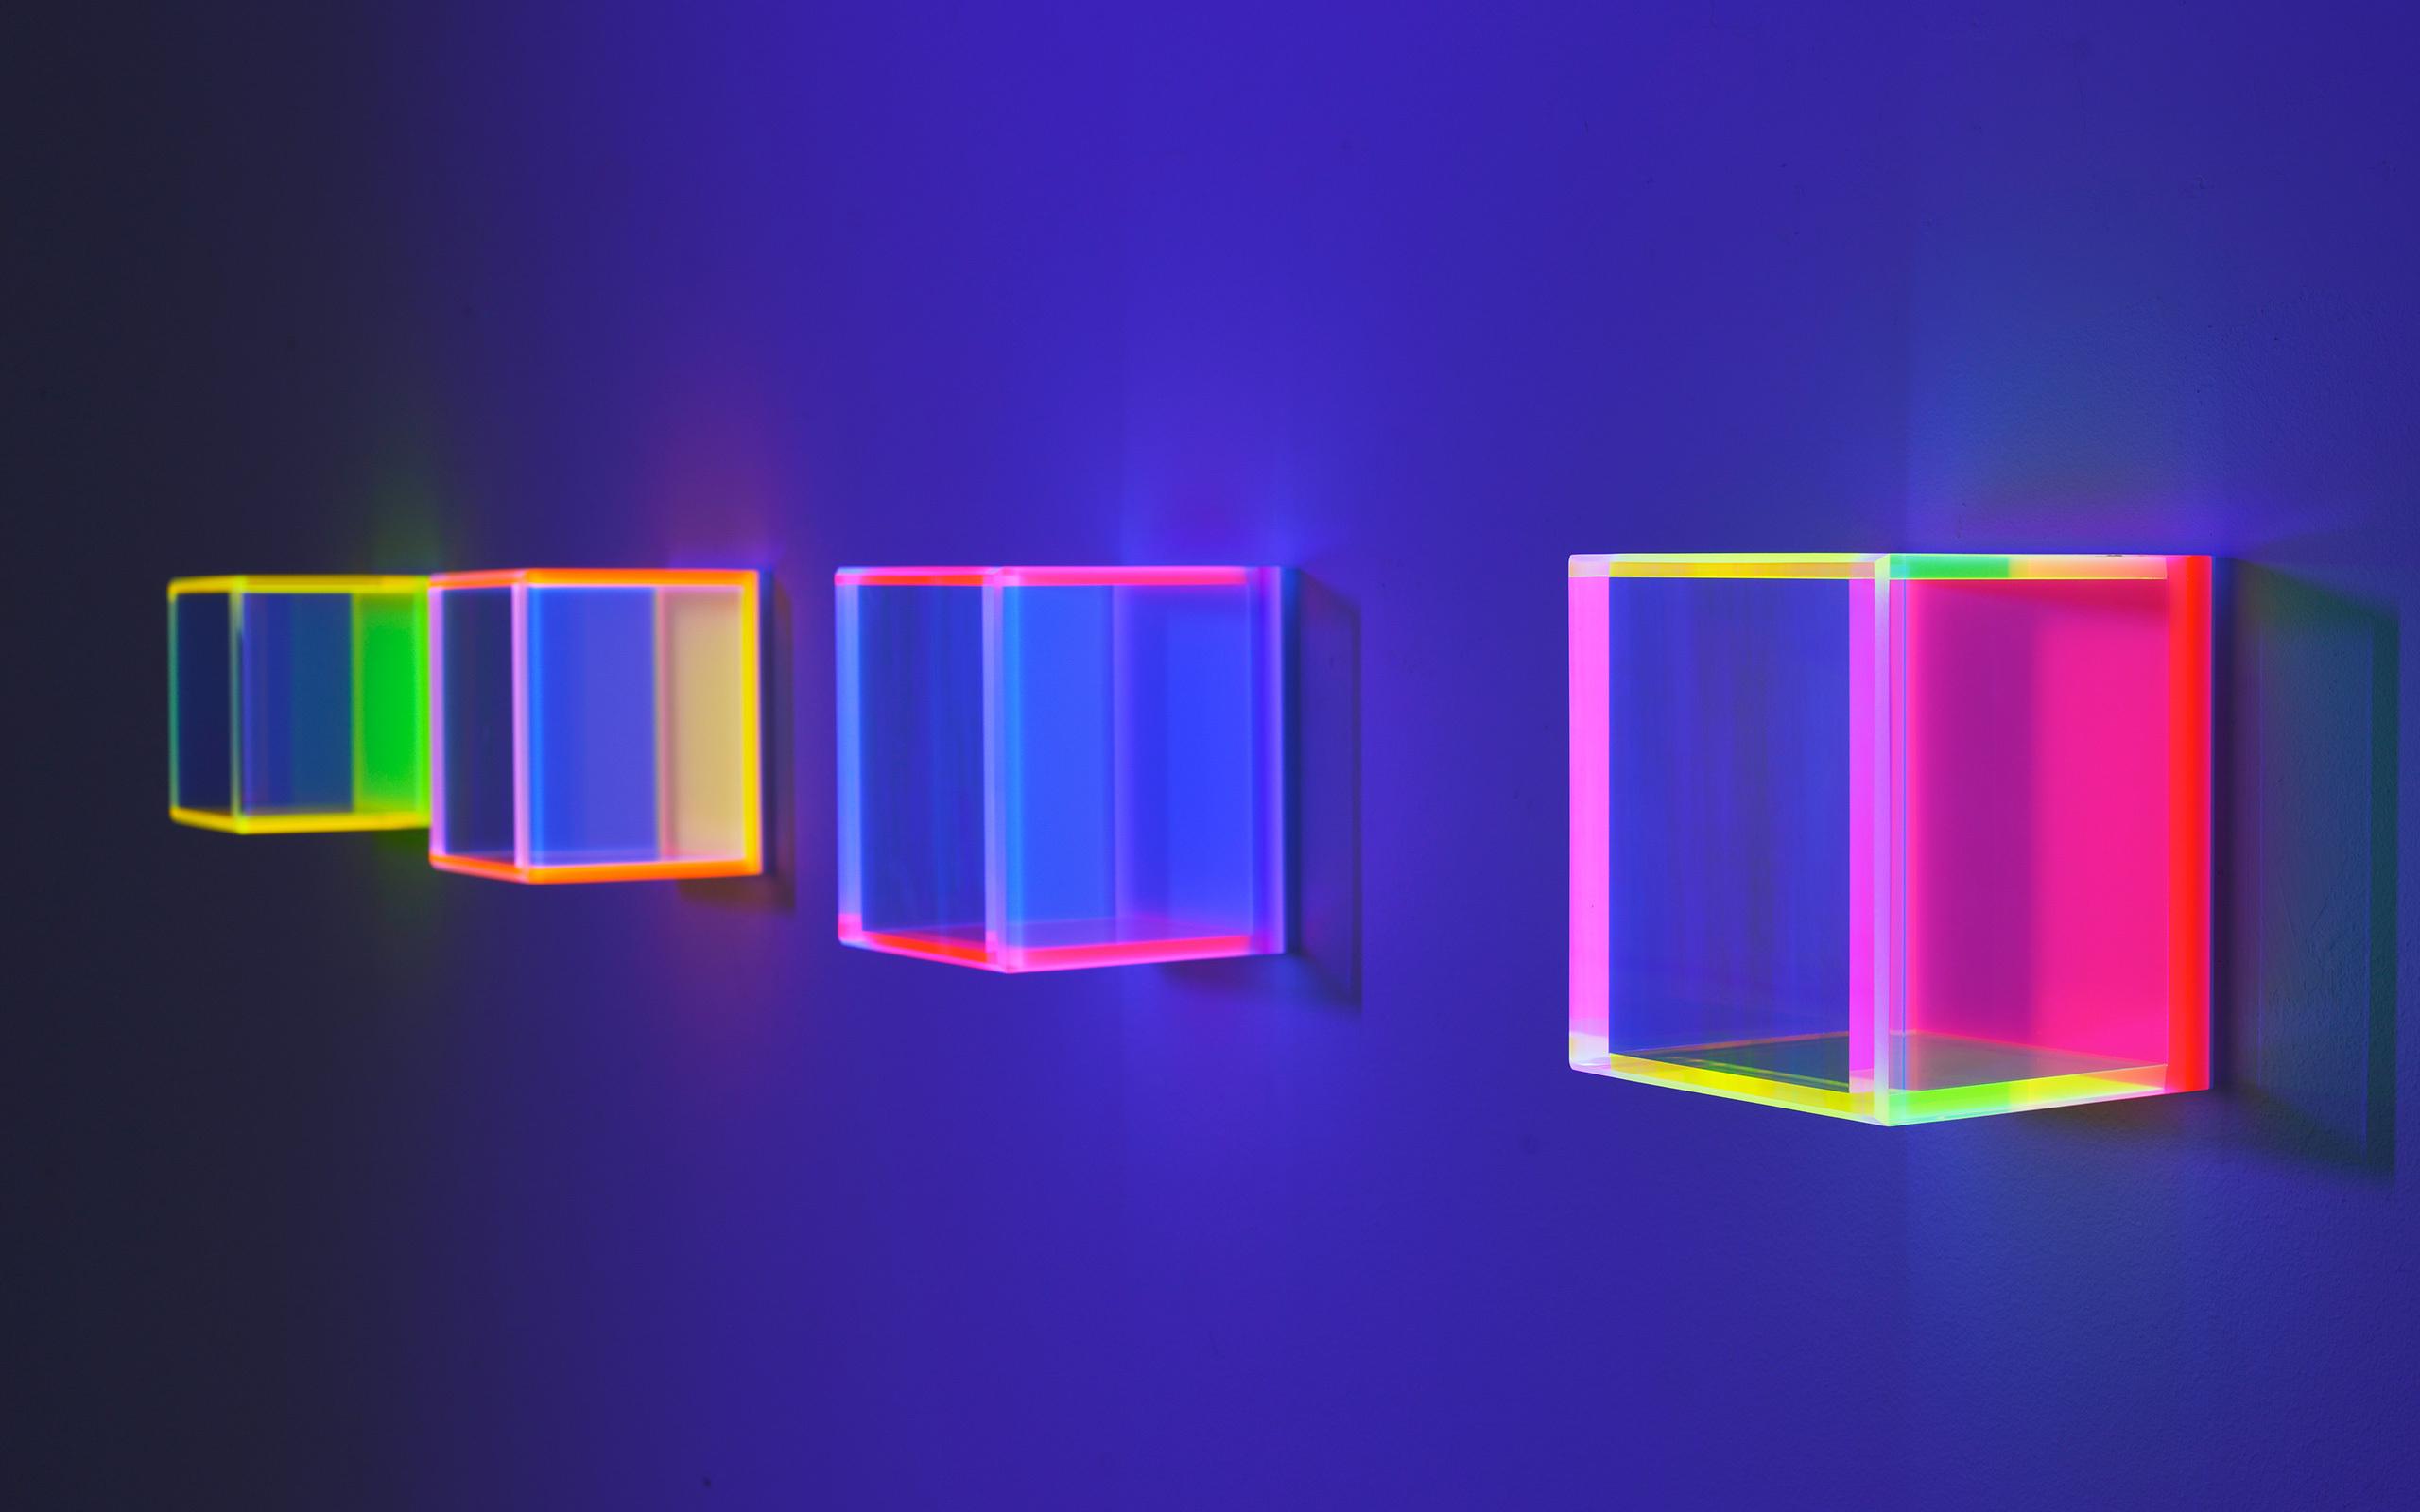 03 Regine Schumann Colormirror Rainbow Full Series 2020